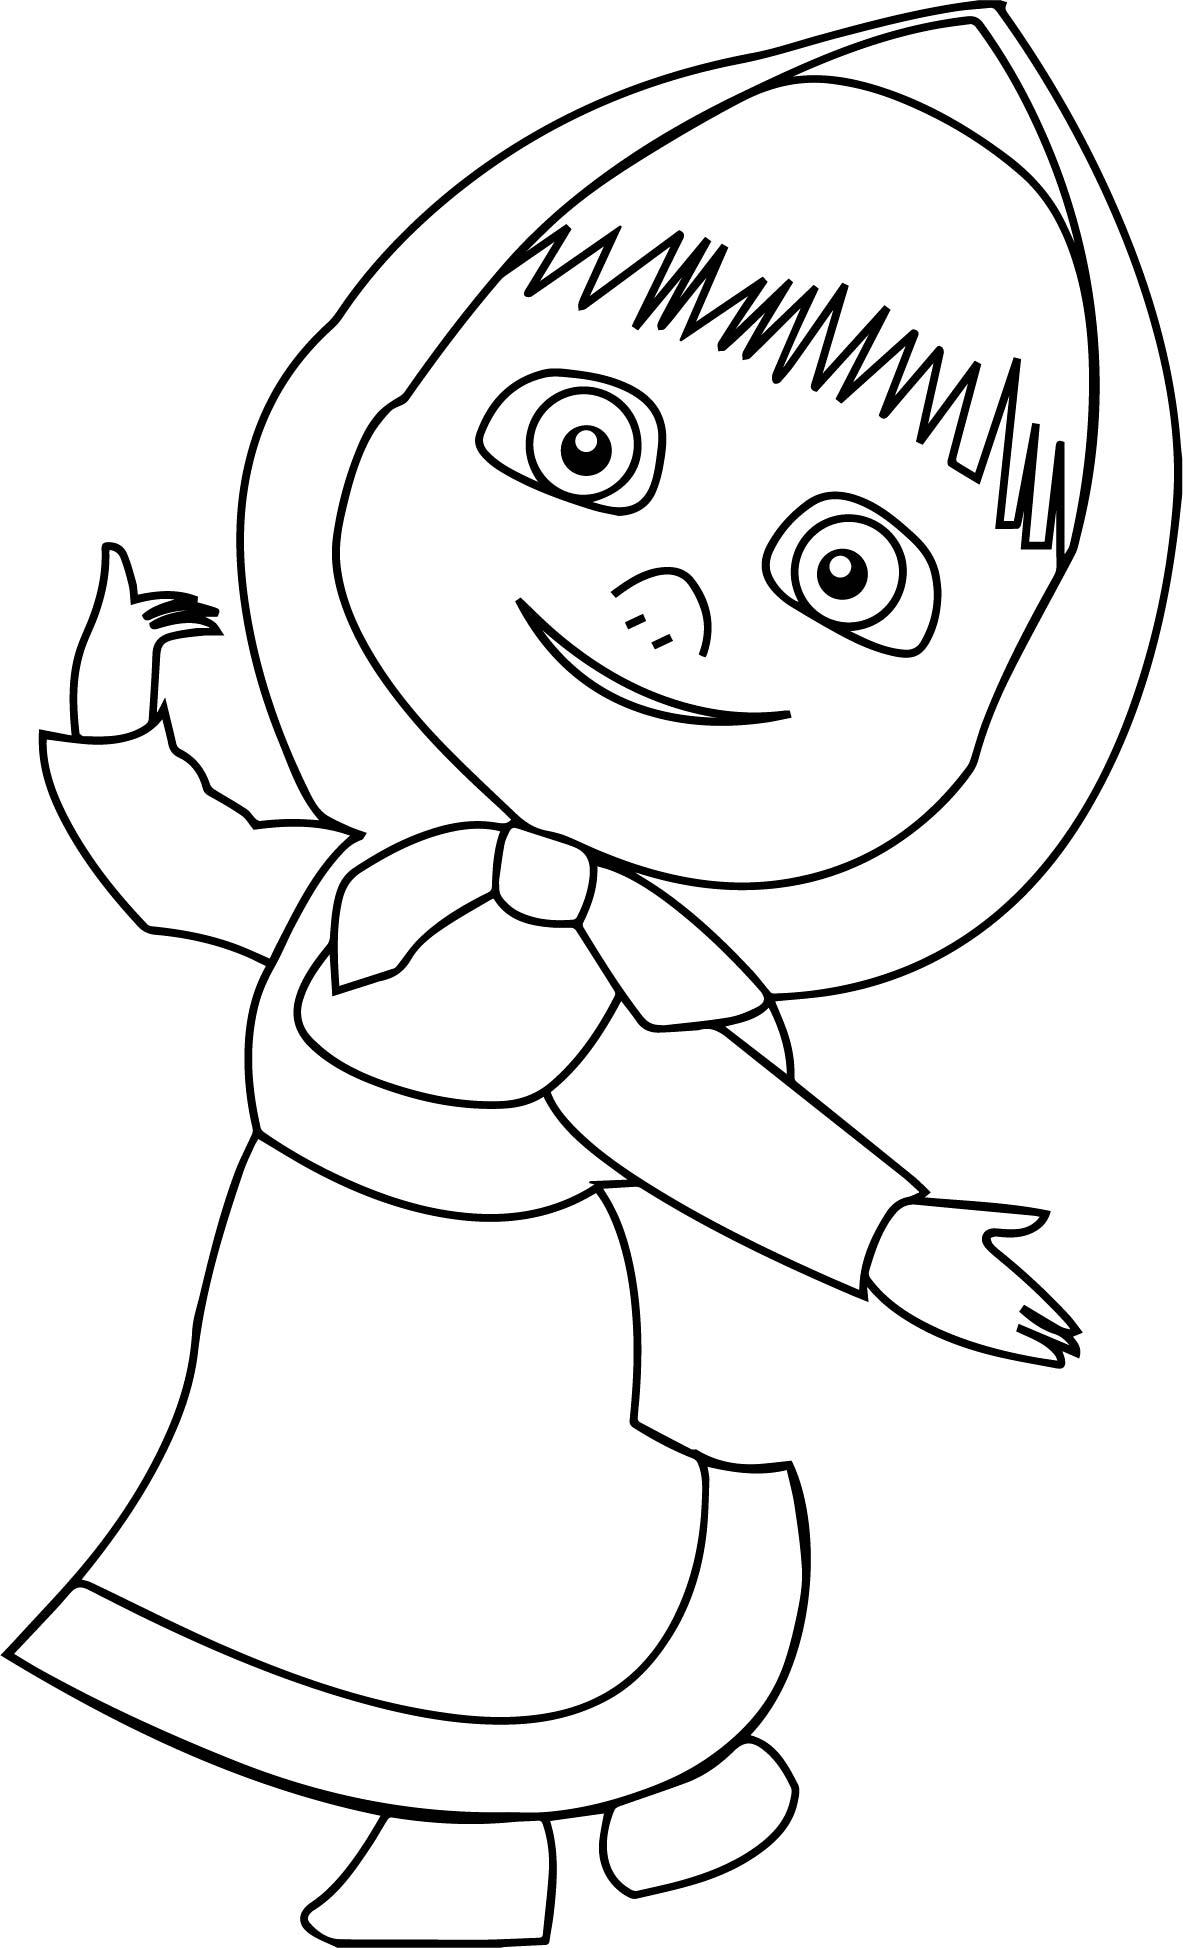 mawa kawa masha bear coloring page wecoloringpage